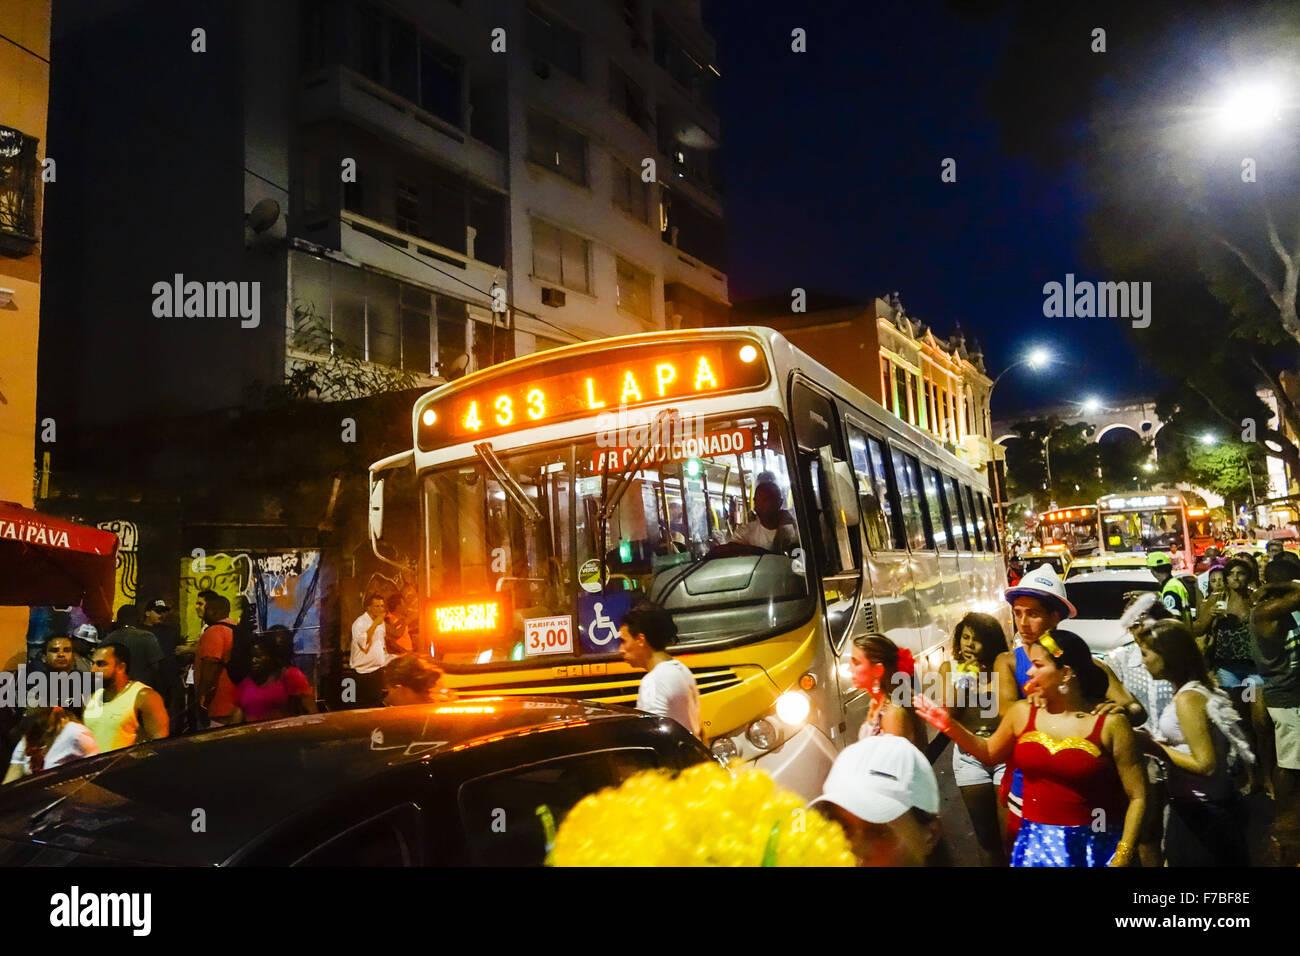 Rio de Janeiro, Lapa, carnaval de rue, Brésil Photo Stock